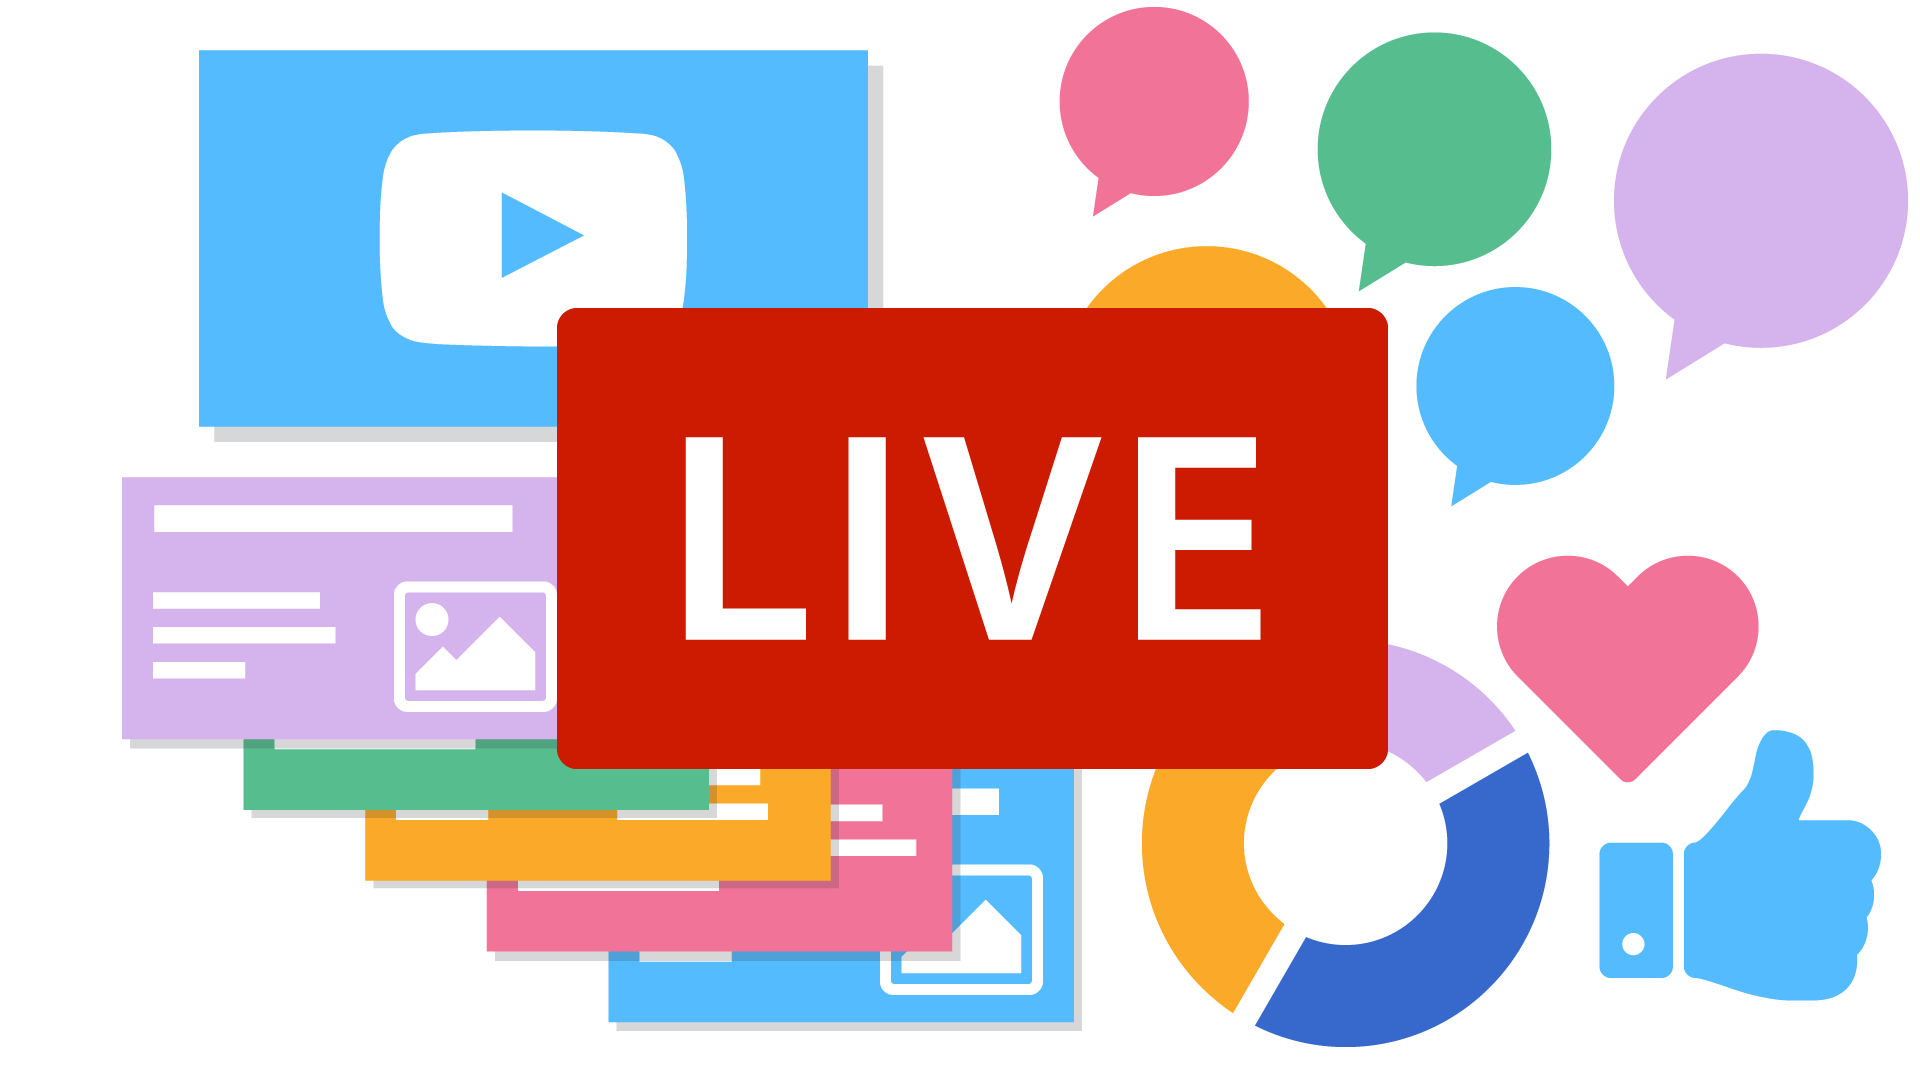 LiveStreaming inklusive interaktiver Elemente